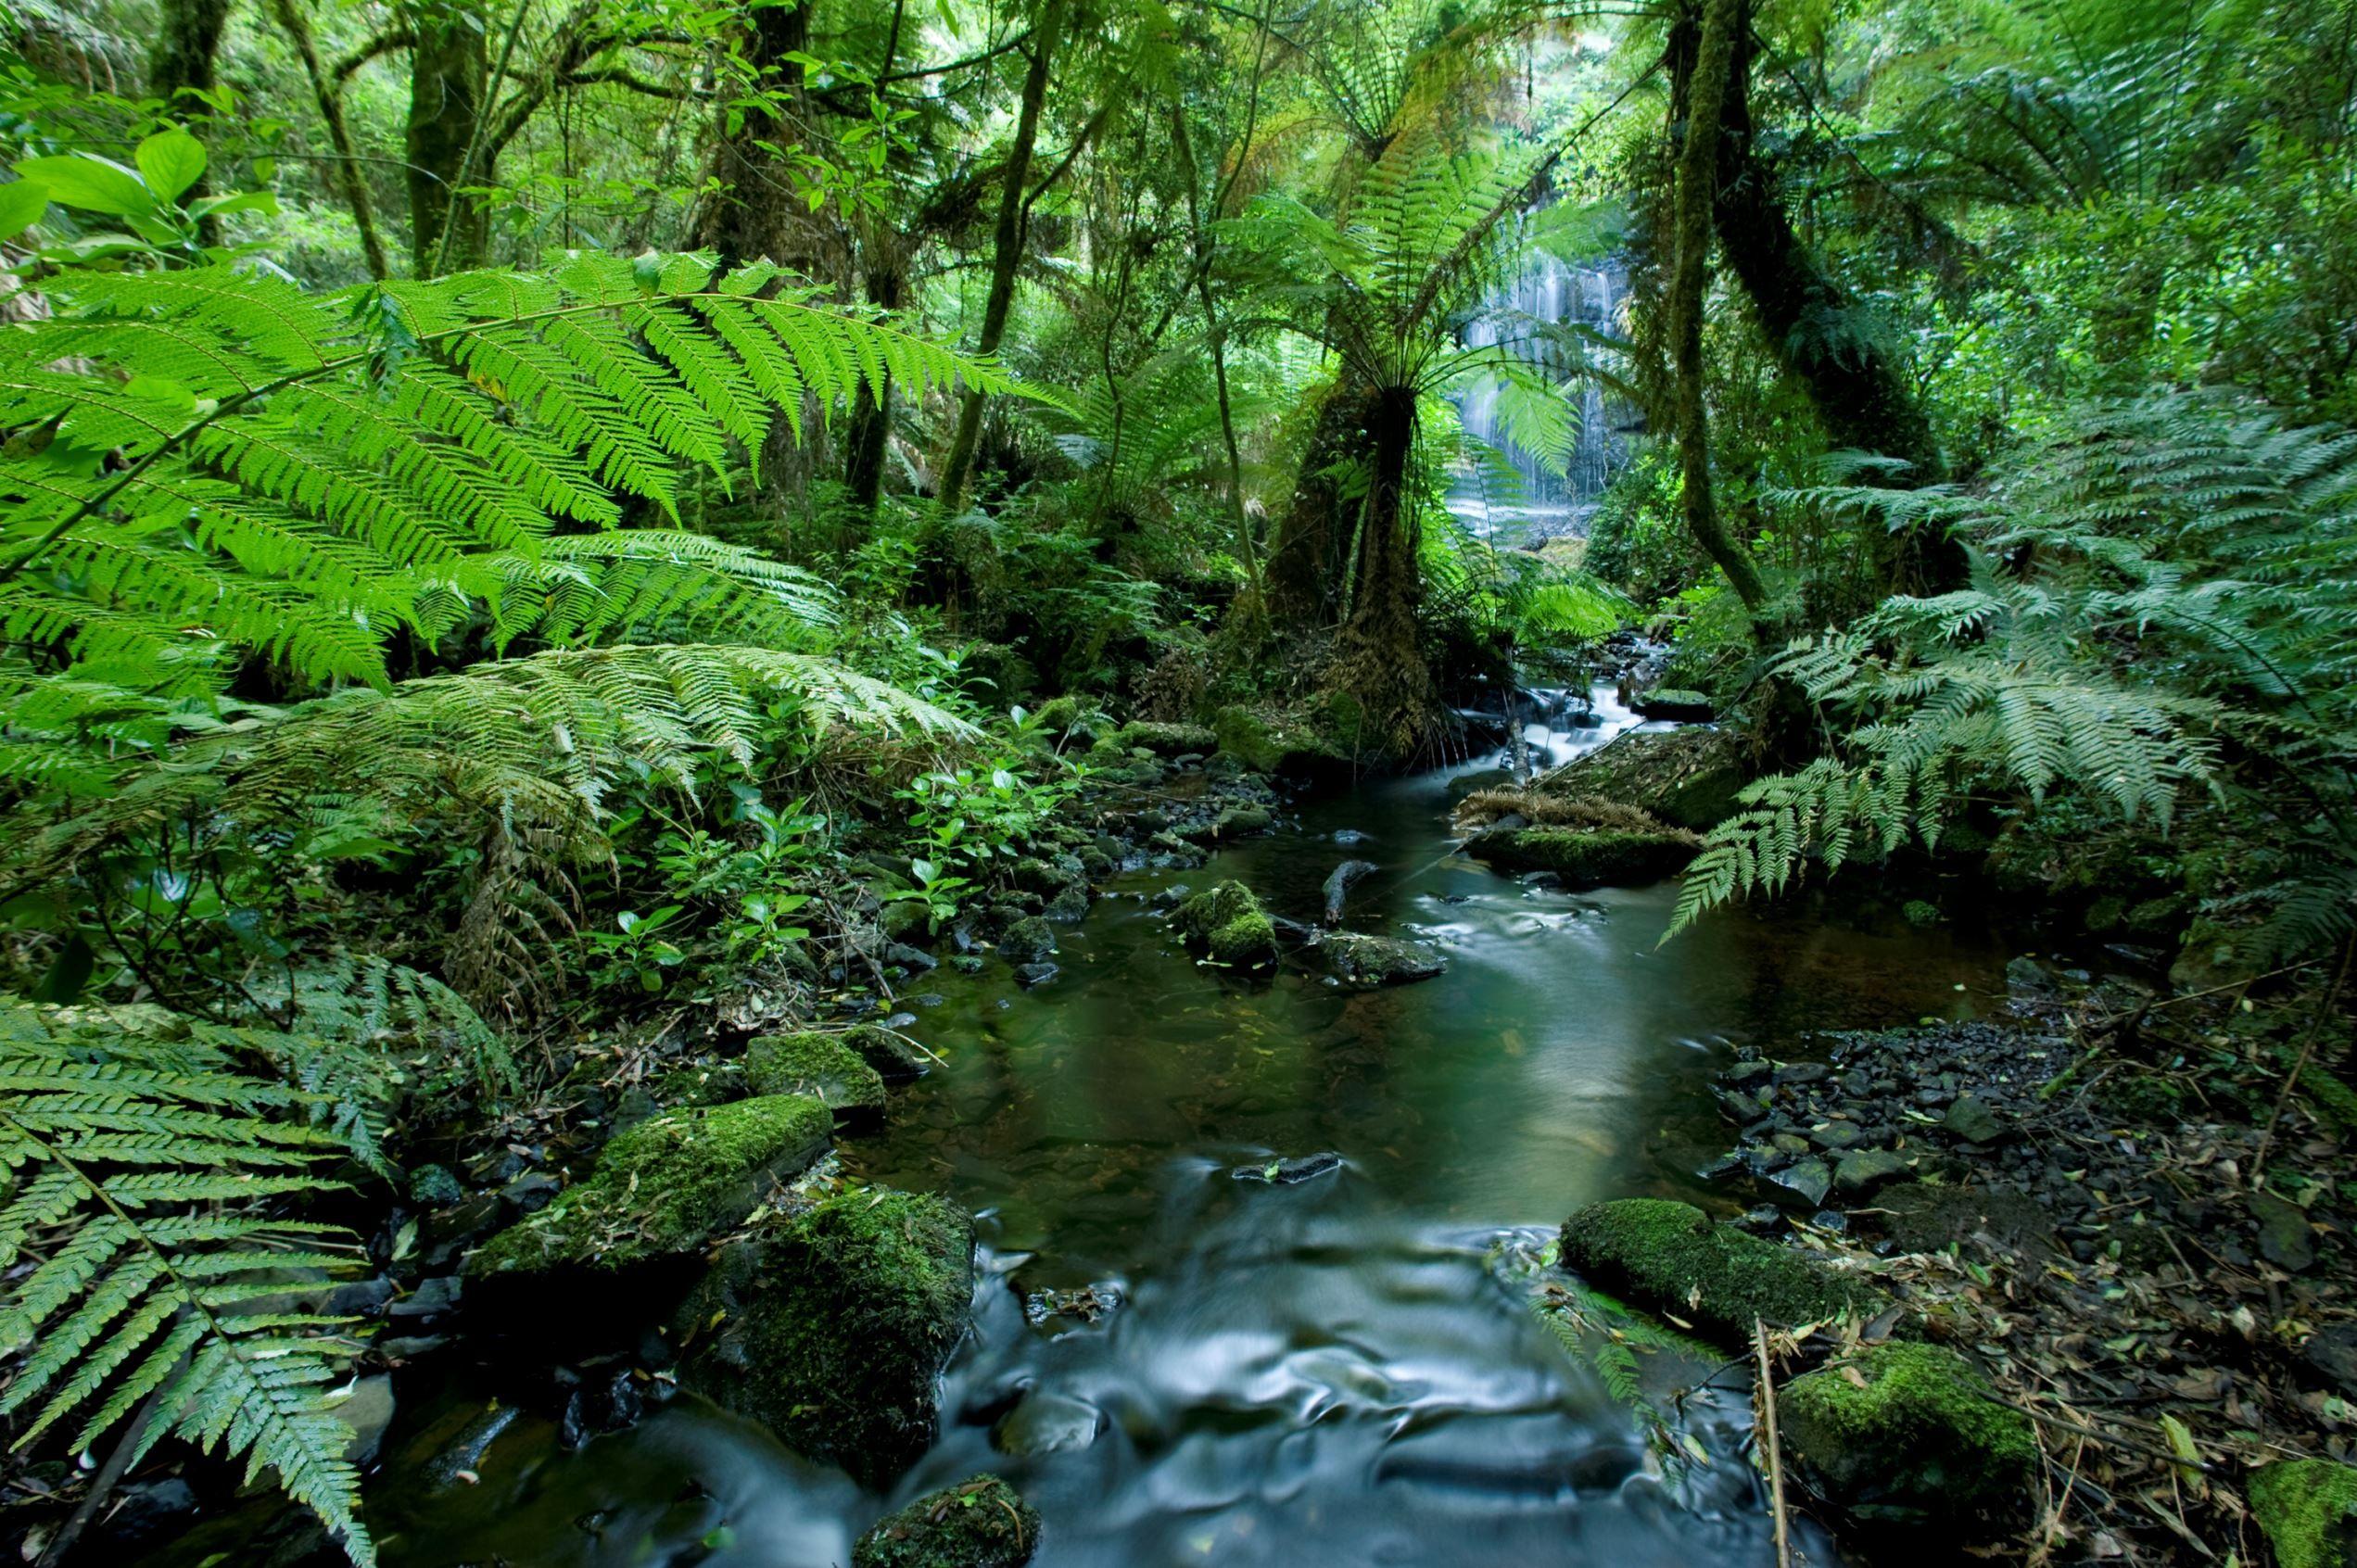 A stream running through a tropical rainforest in Brazil